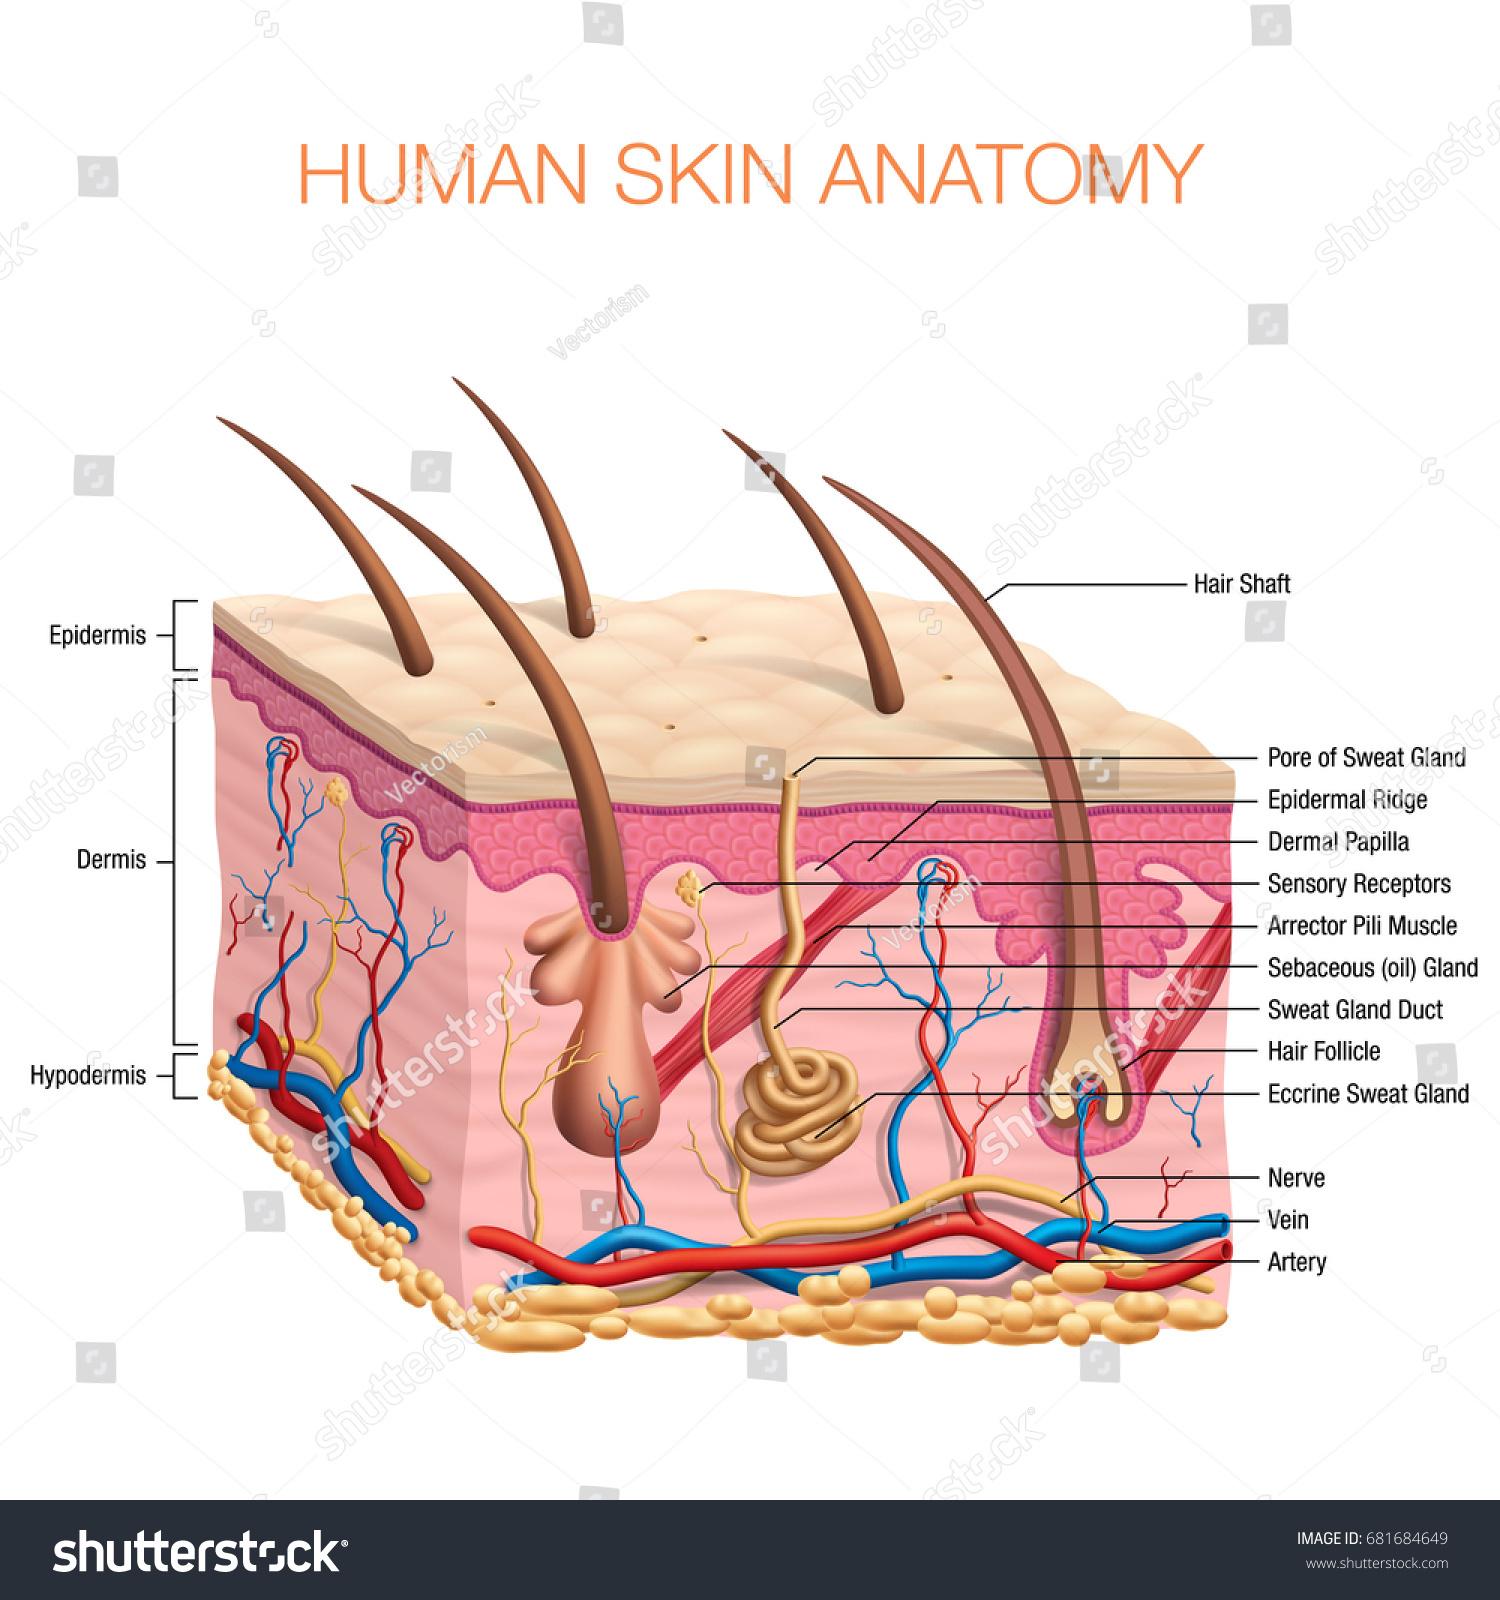 Human Skin Anatomy Vector Illustration Isolated Stock-Vektorgrafik ...